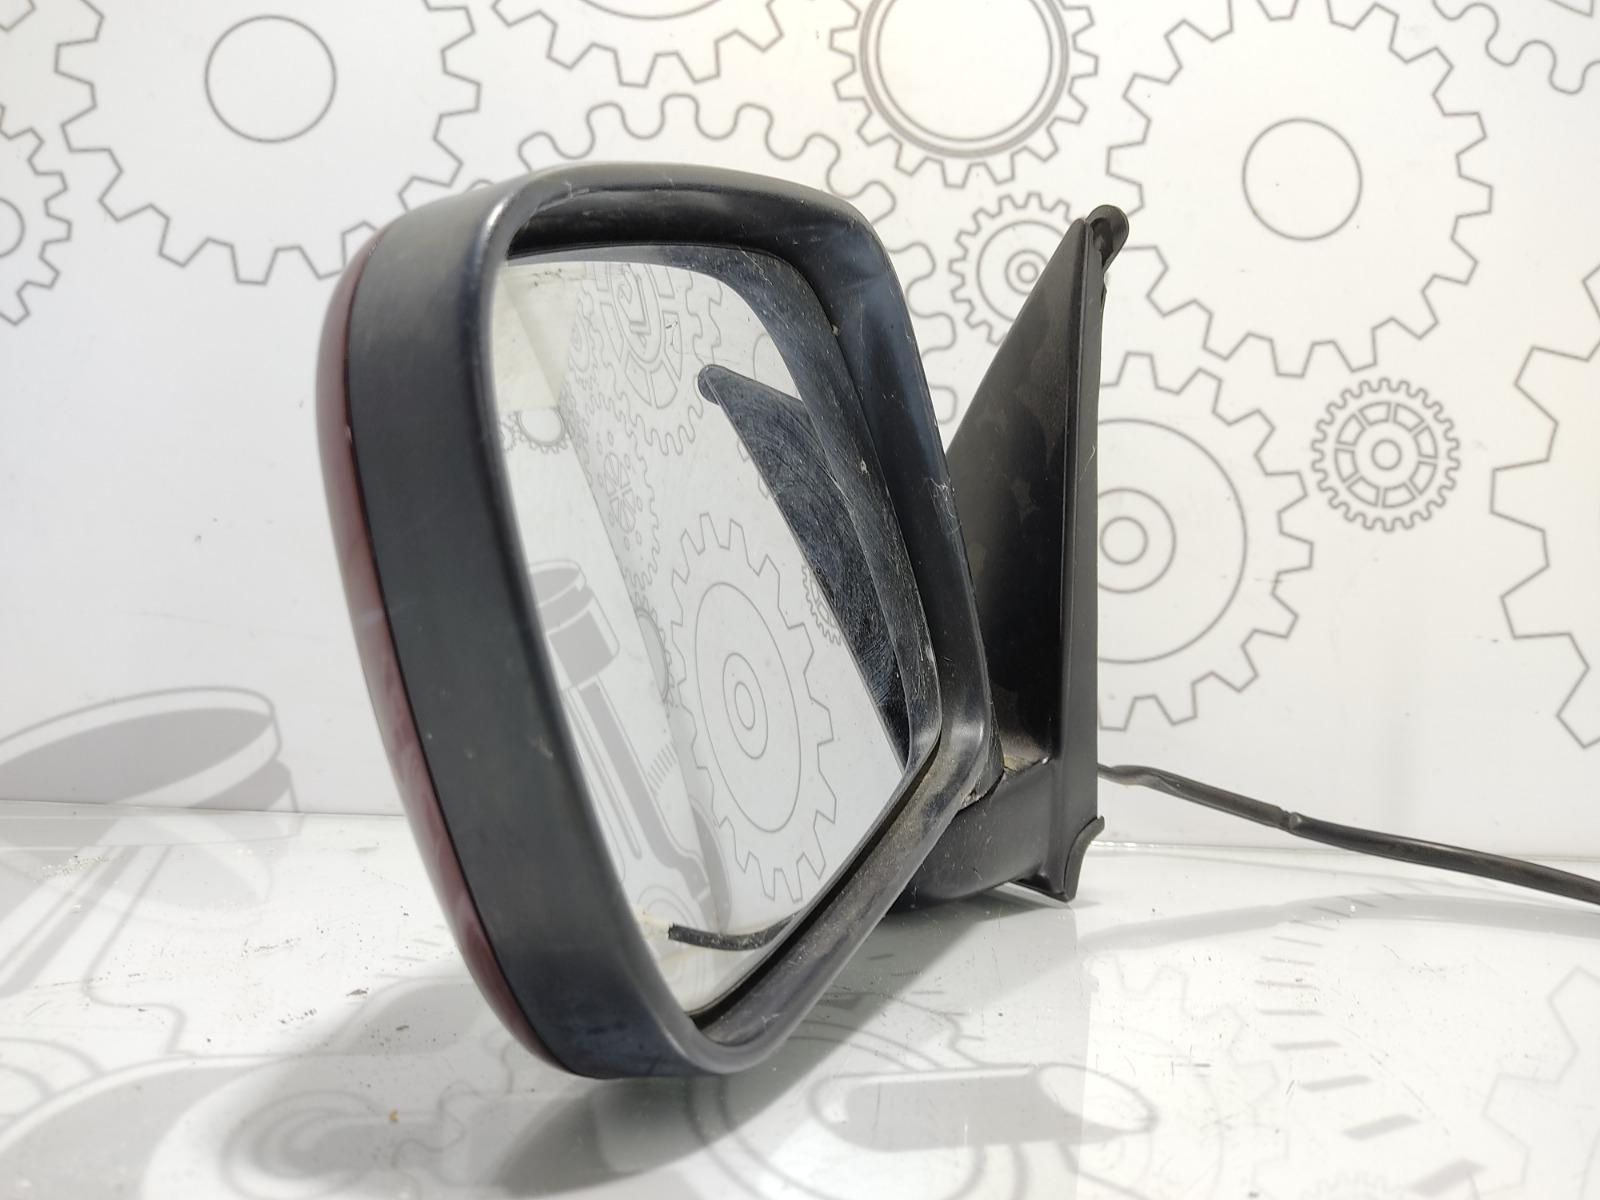 Зеркало наружное левое Nissan Terrano 3.0 DI 2003 (б/у)